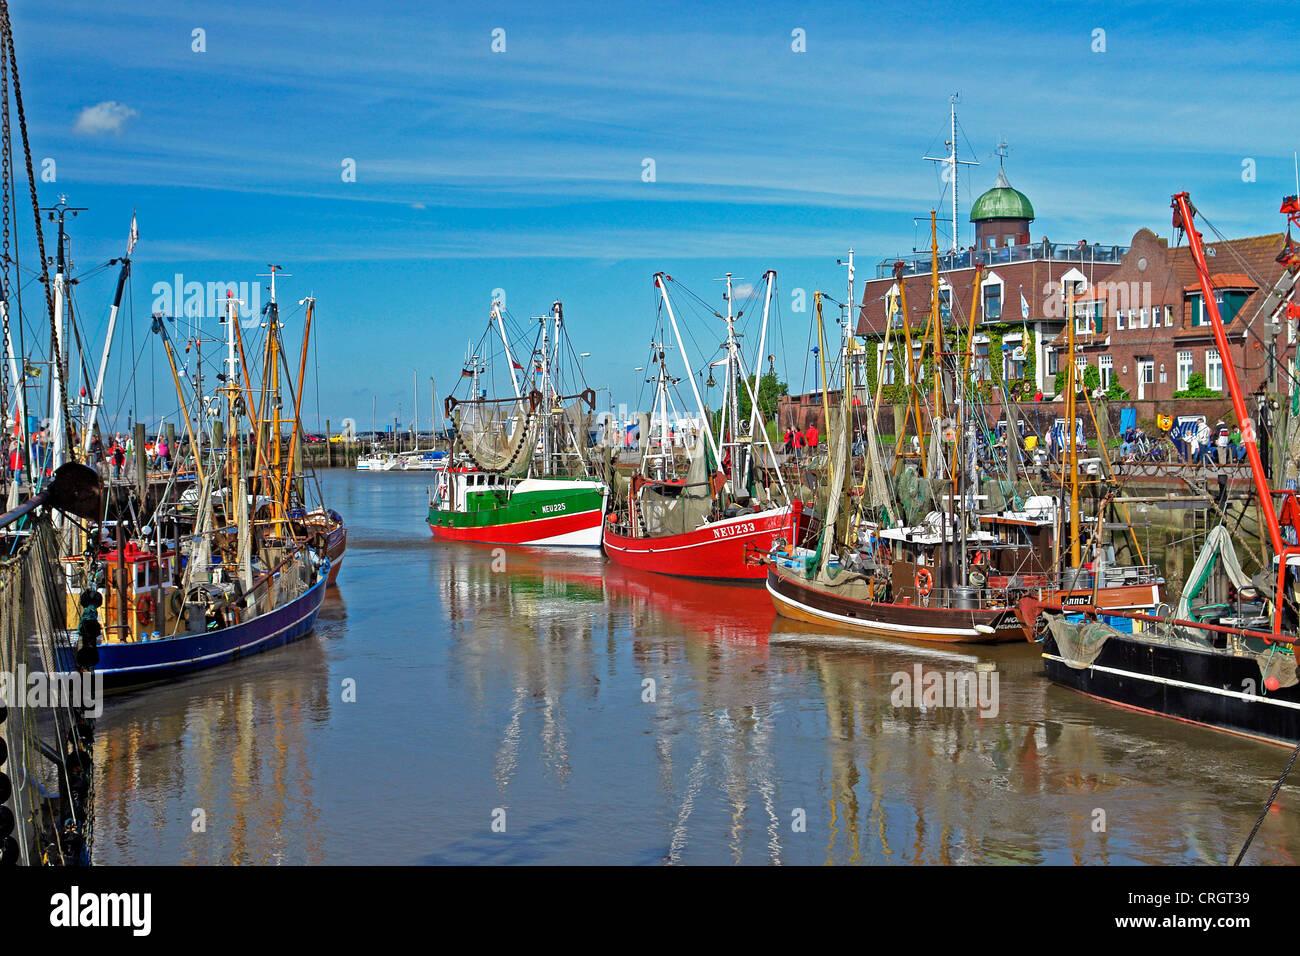 Neuharlingersiel - Harbour, Germany, Lower Saxony, East Frisia - Stock Image